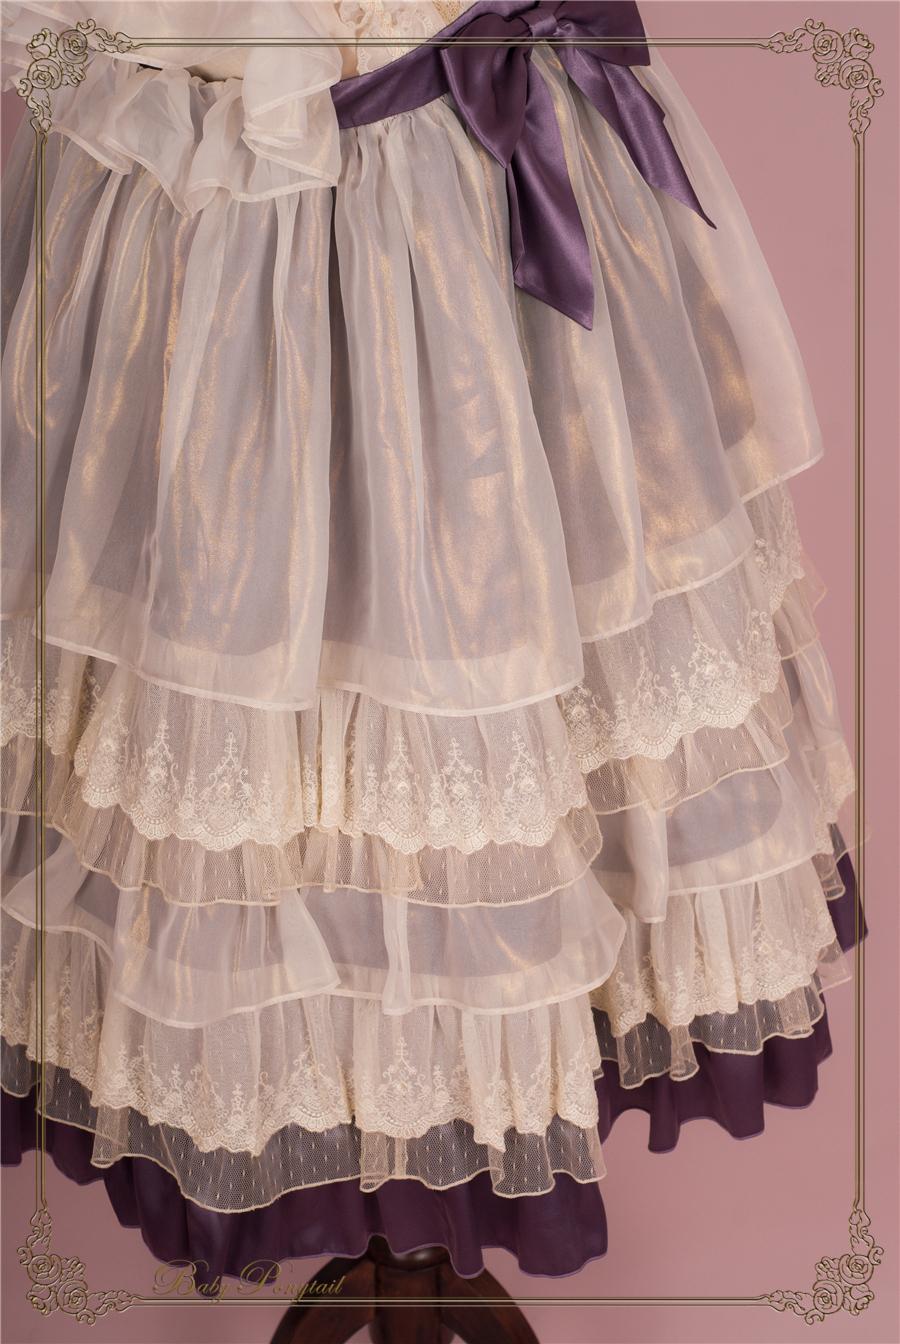 Babyponytail_Stock Photo_Present Angel_JSK Lavender_4.jpg